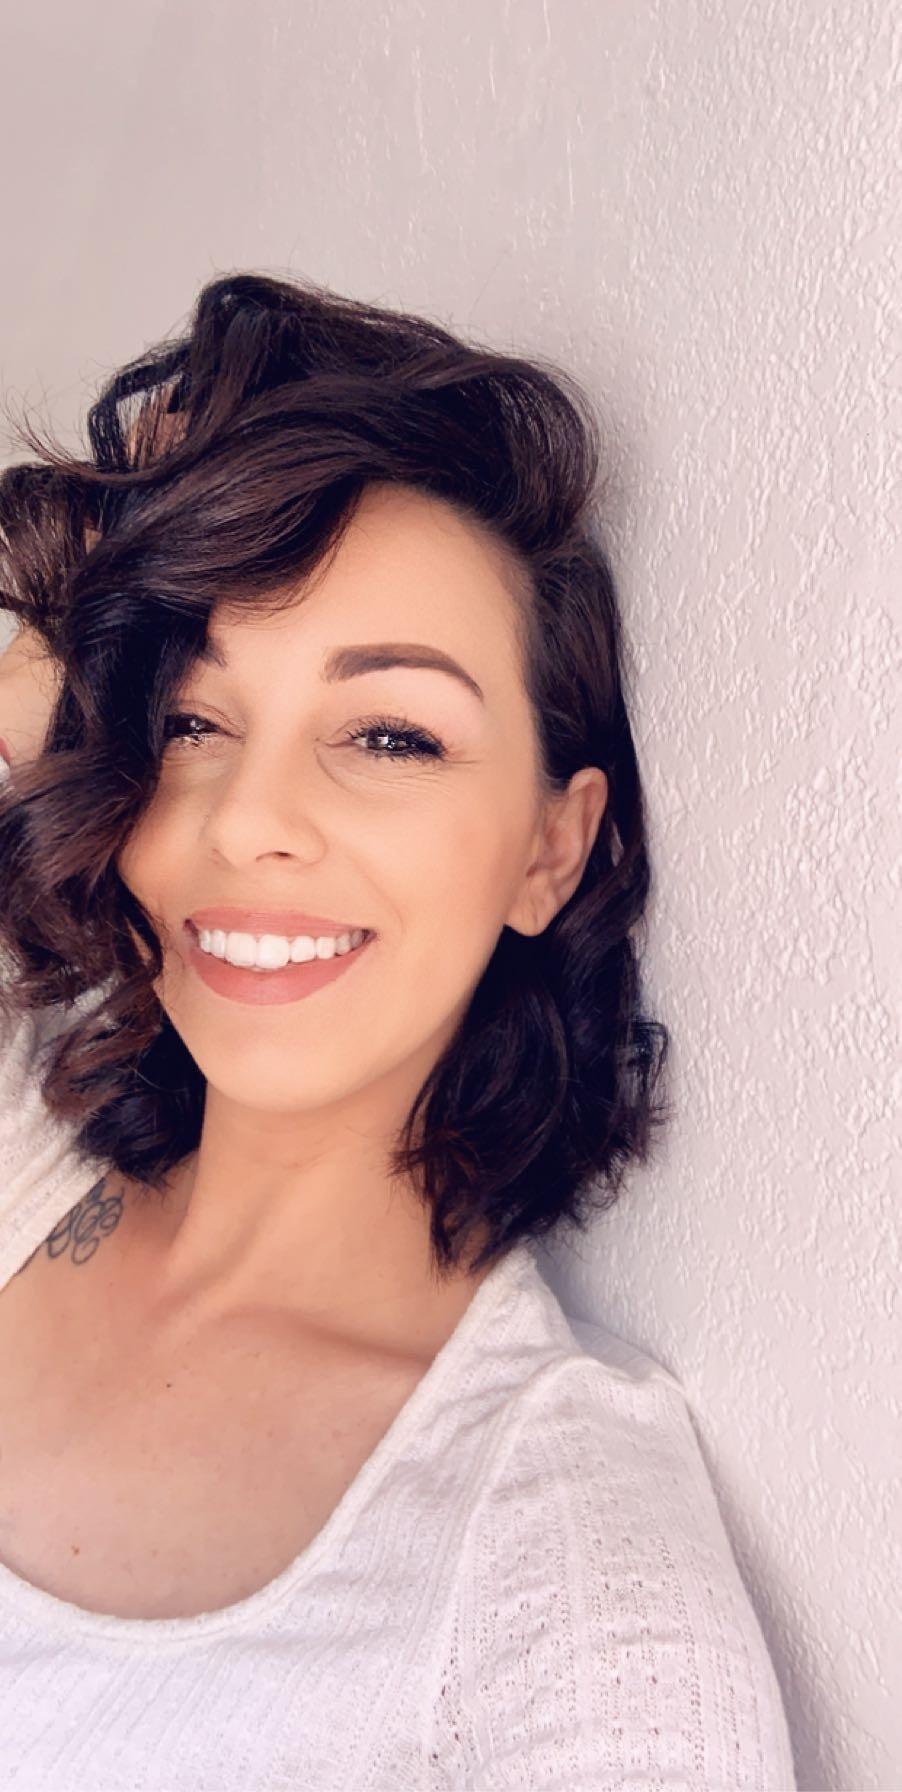 Paige Serrano